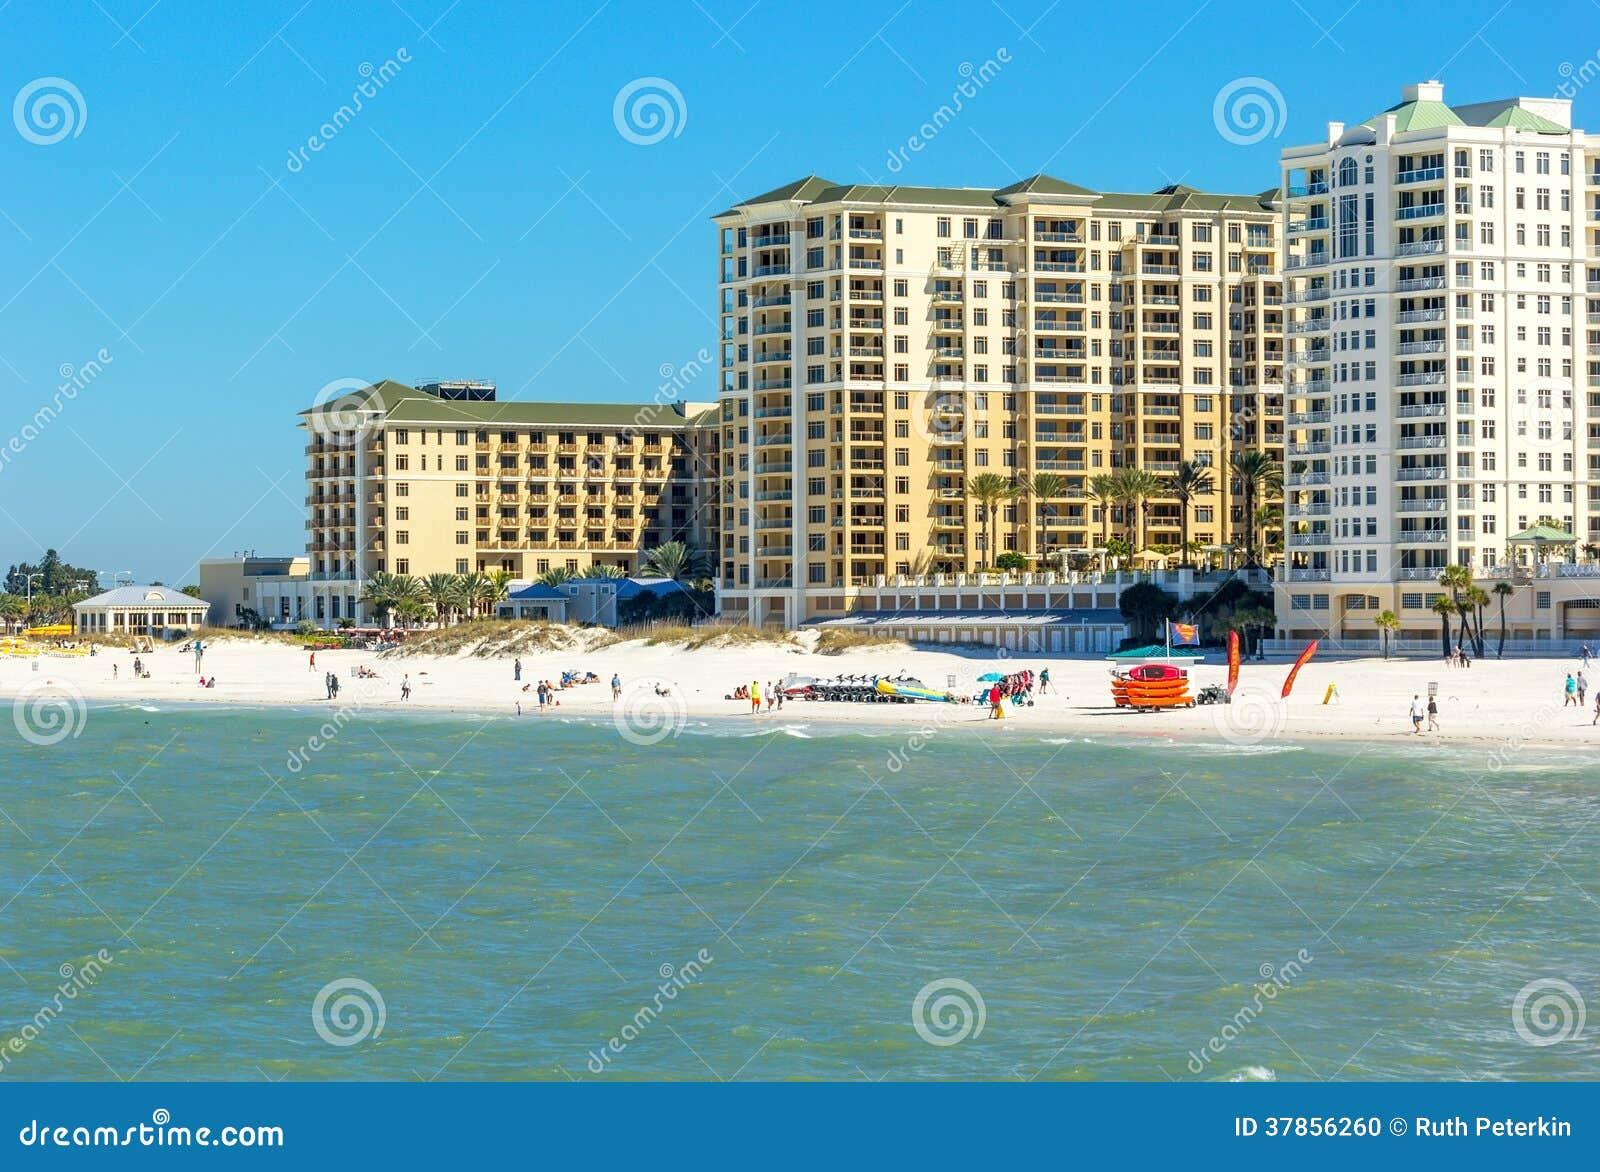 Clearwater Beach Florida In February